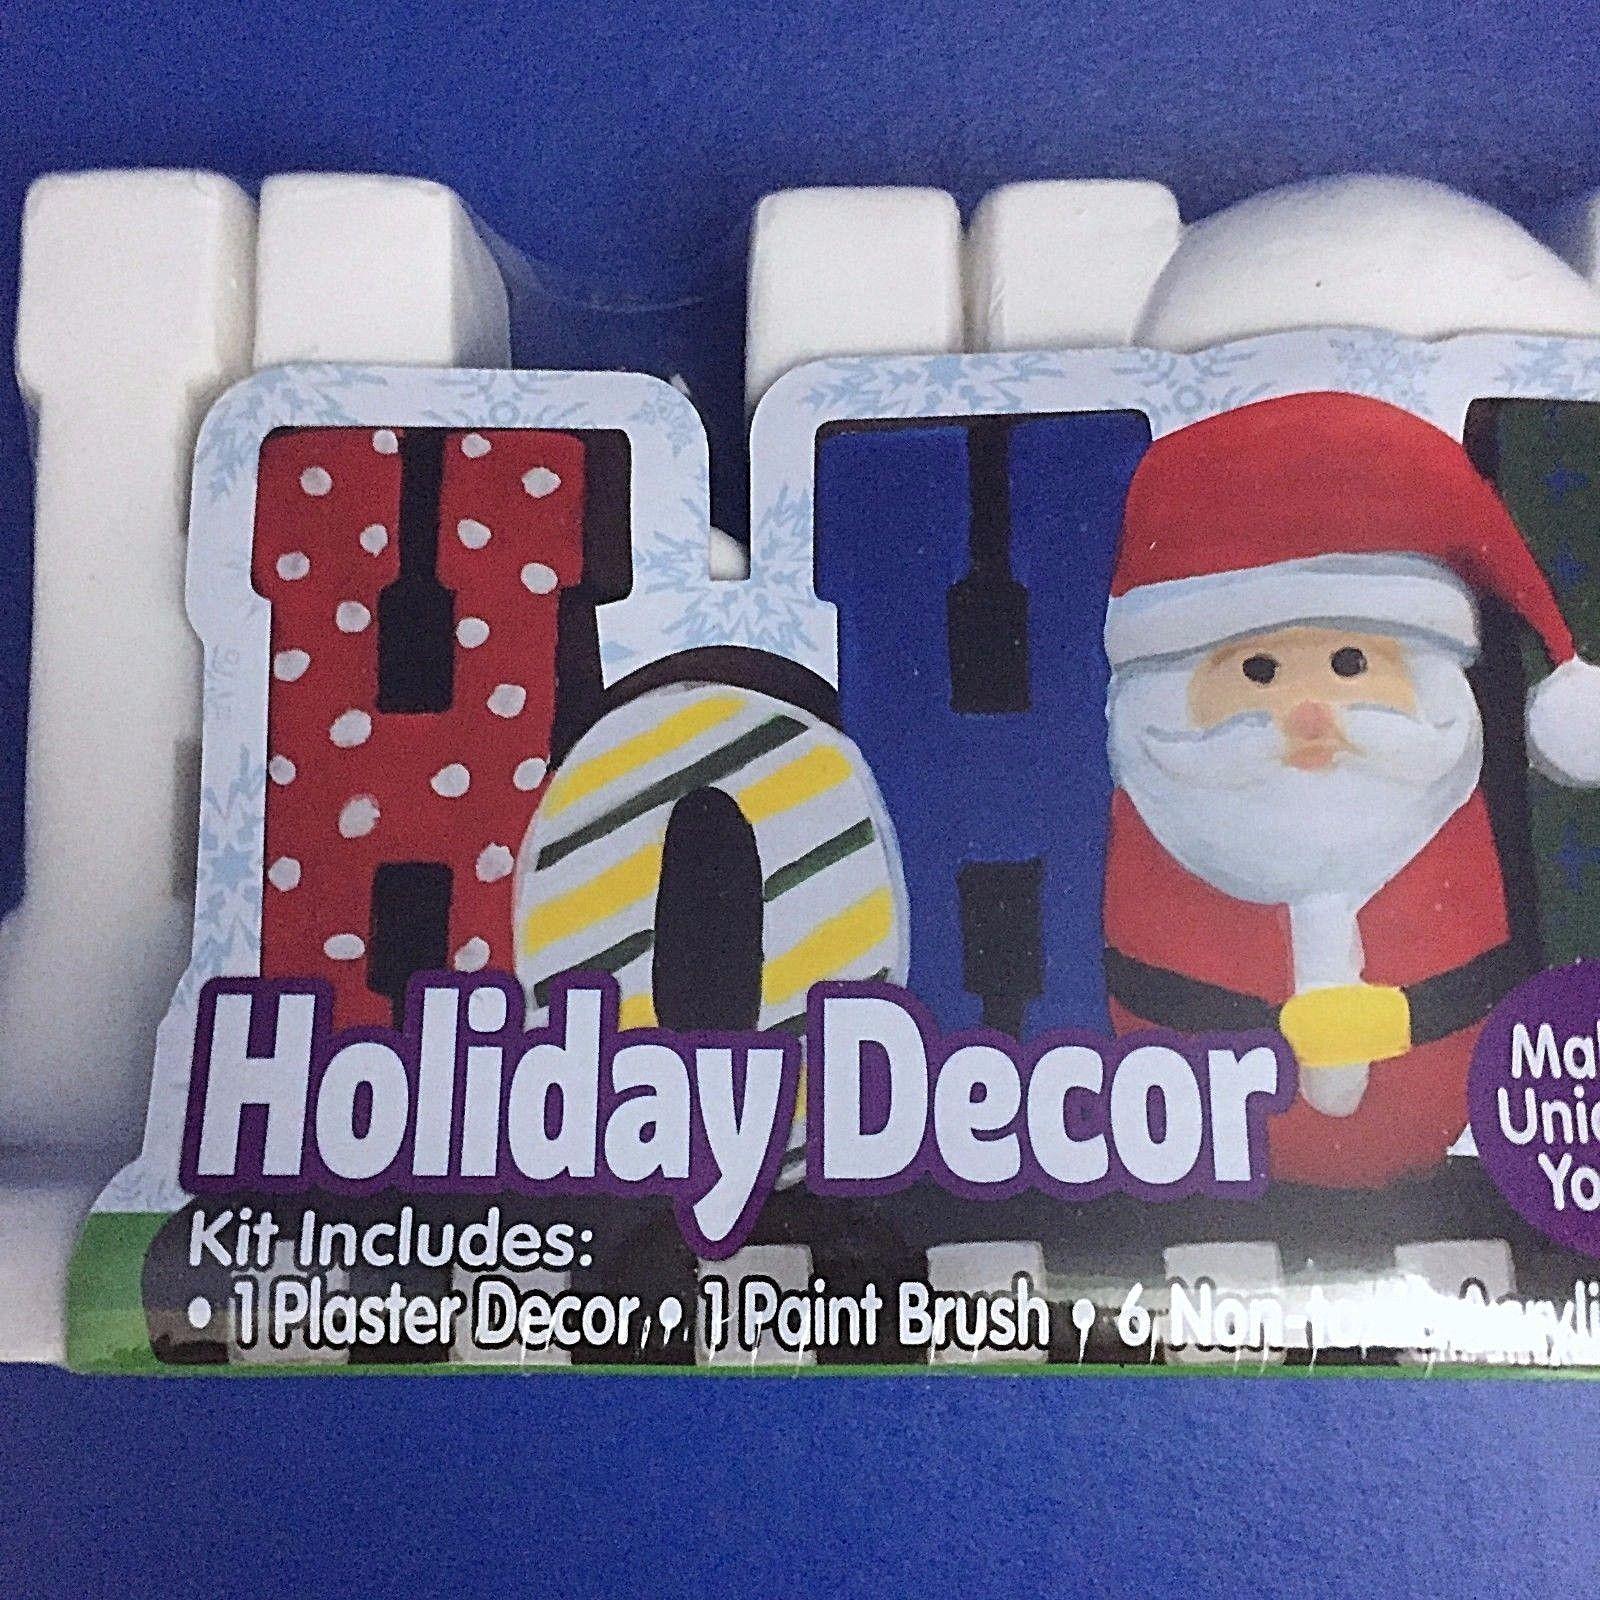 ec33e5c493e7b Santa Ho Ho Ho Holiday Plaster Decor Acrylic Paint Kids Childrens Craft  Ages 6+